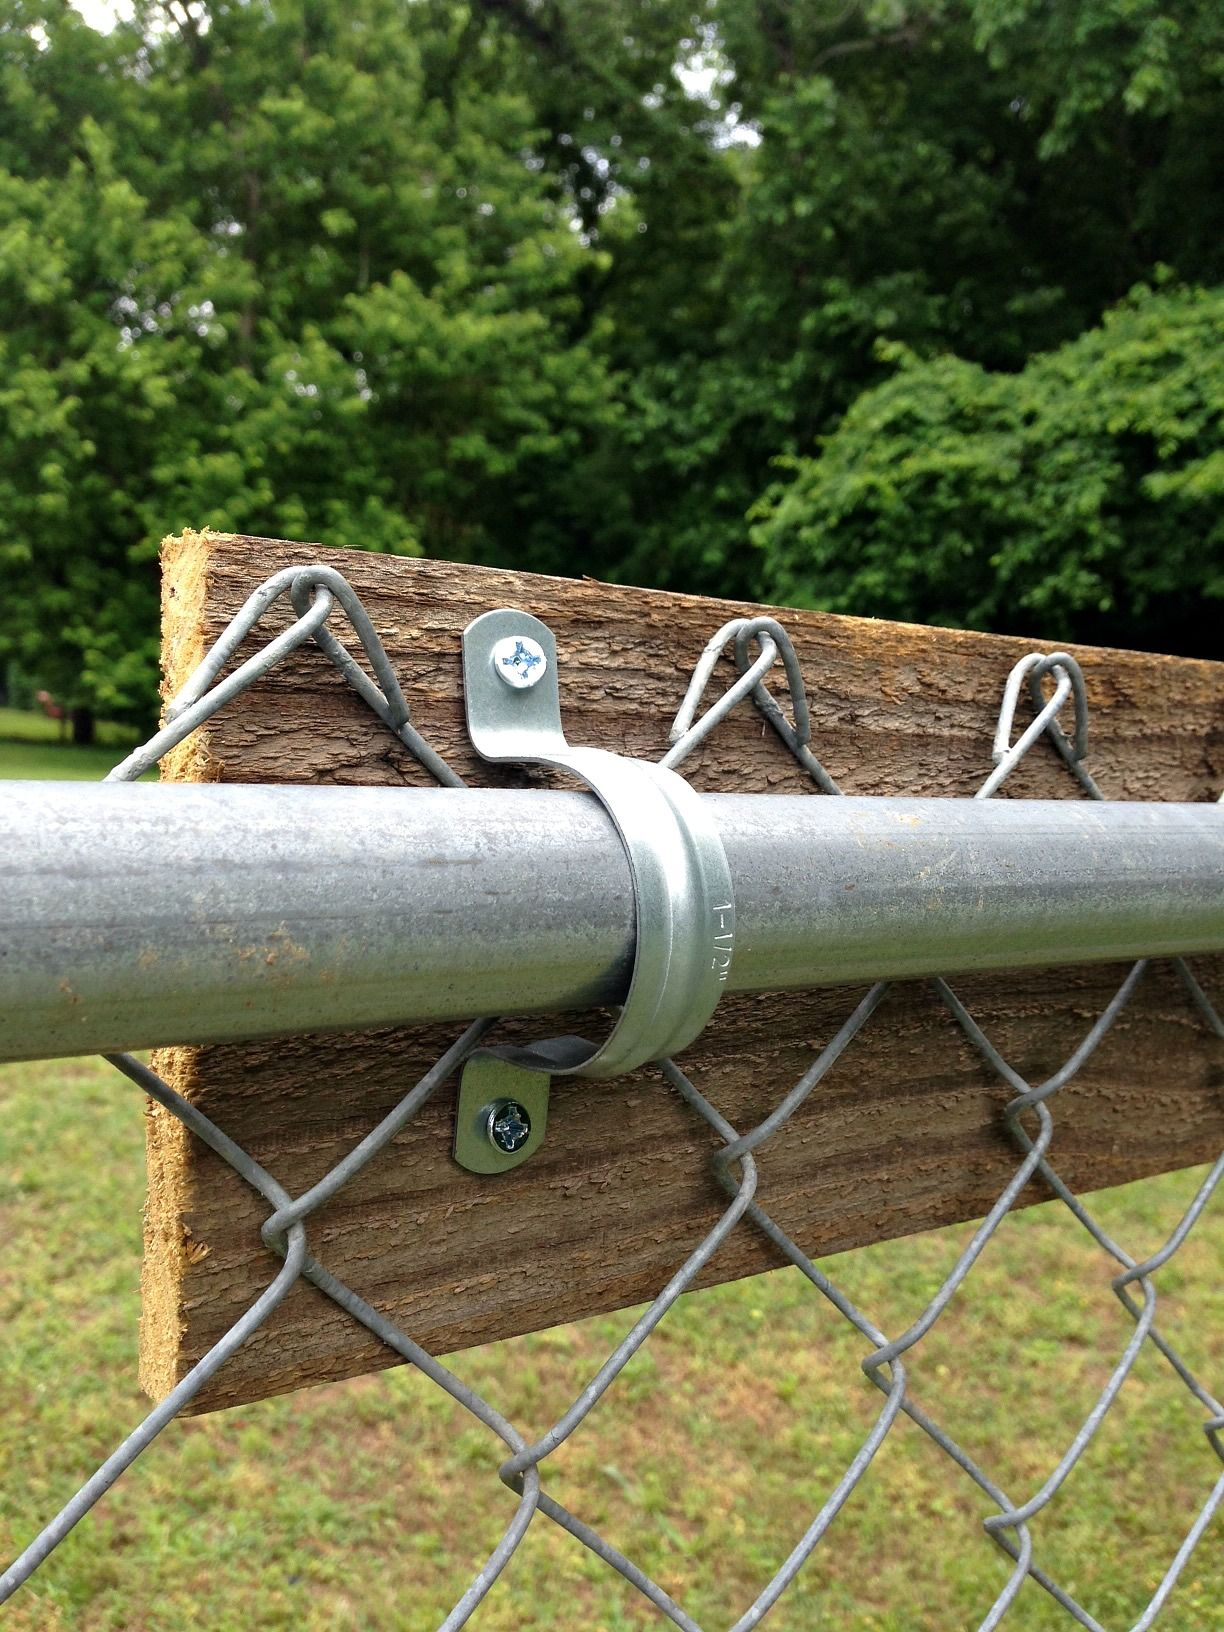 Medium Crop Of Backyard Fence Decoration Ideas